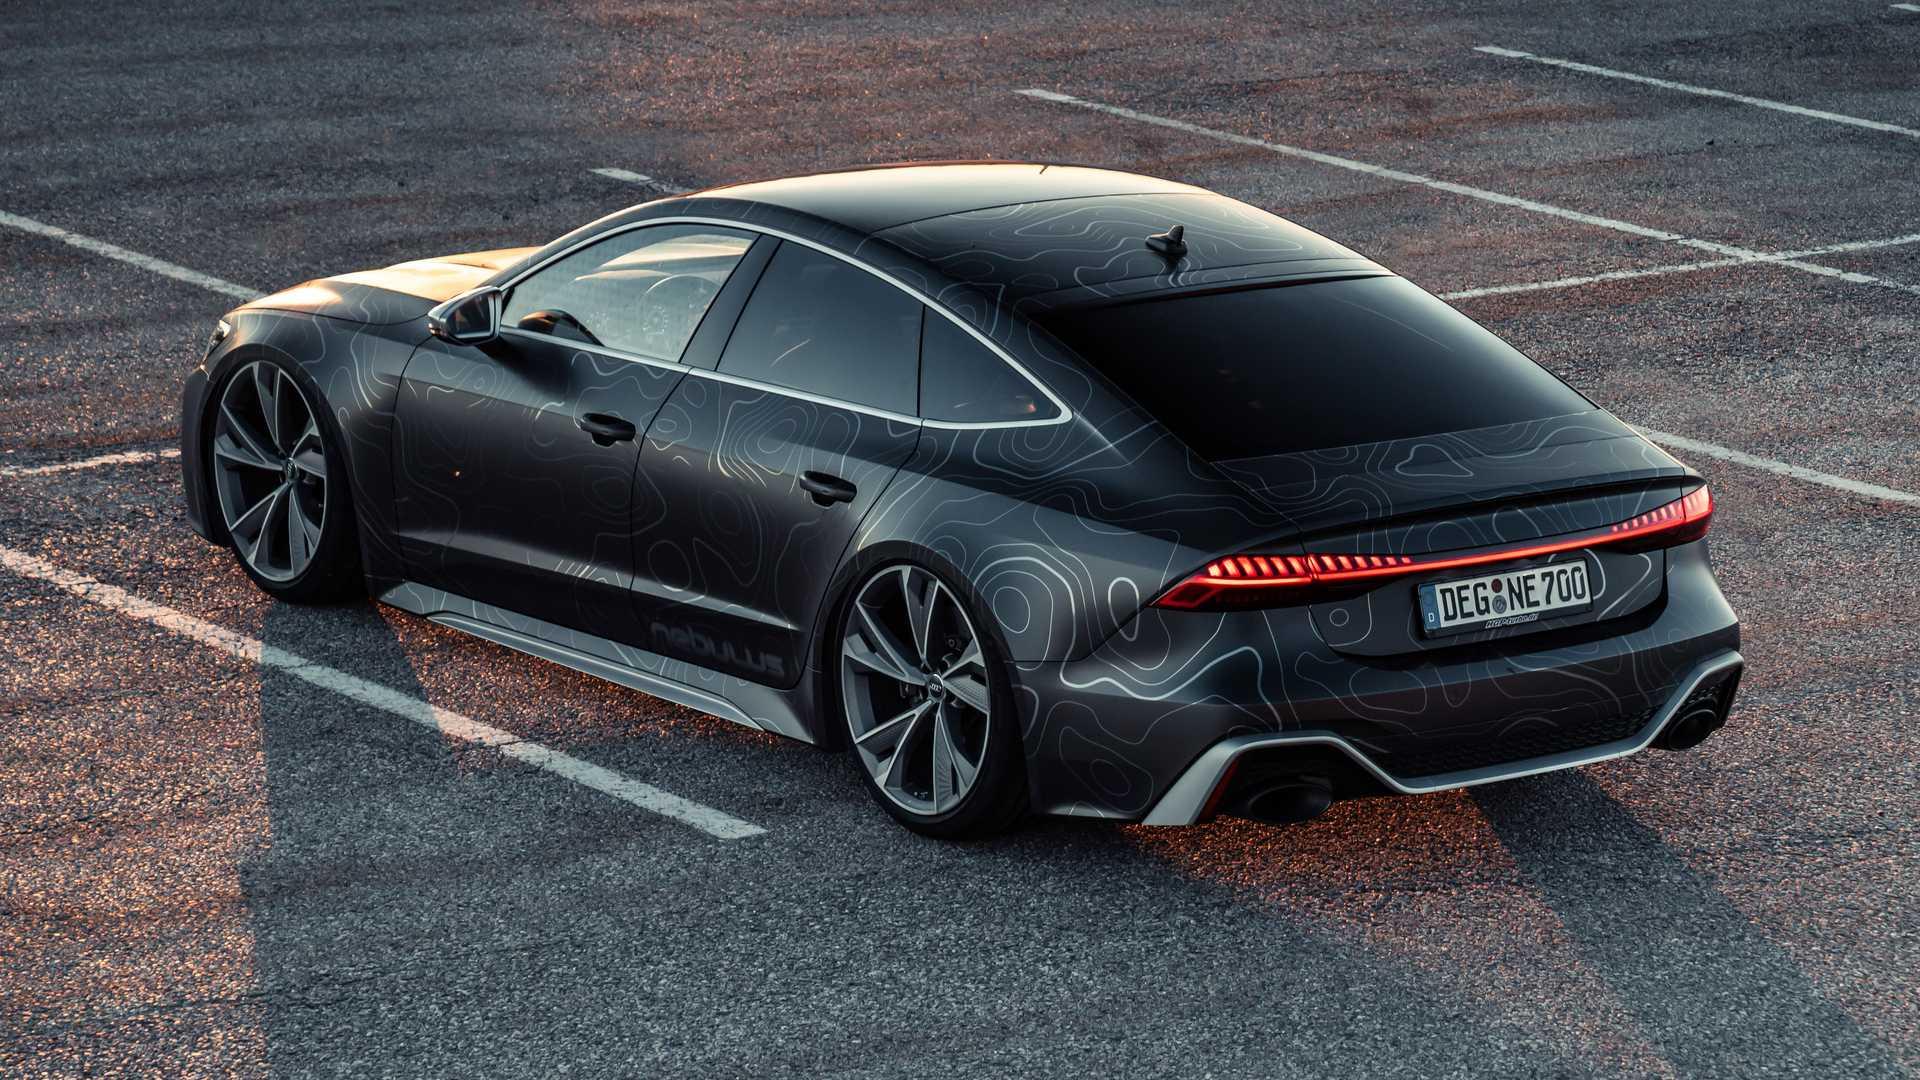 Audi-RS7-By-Black-Box-Richter-9